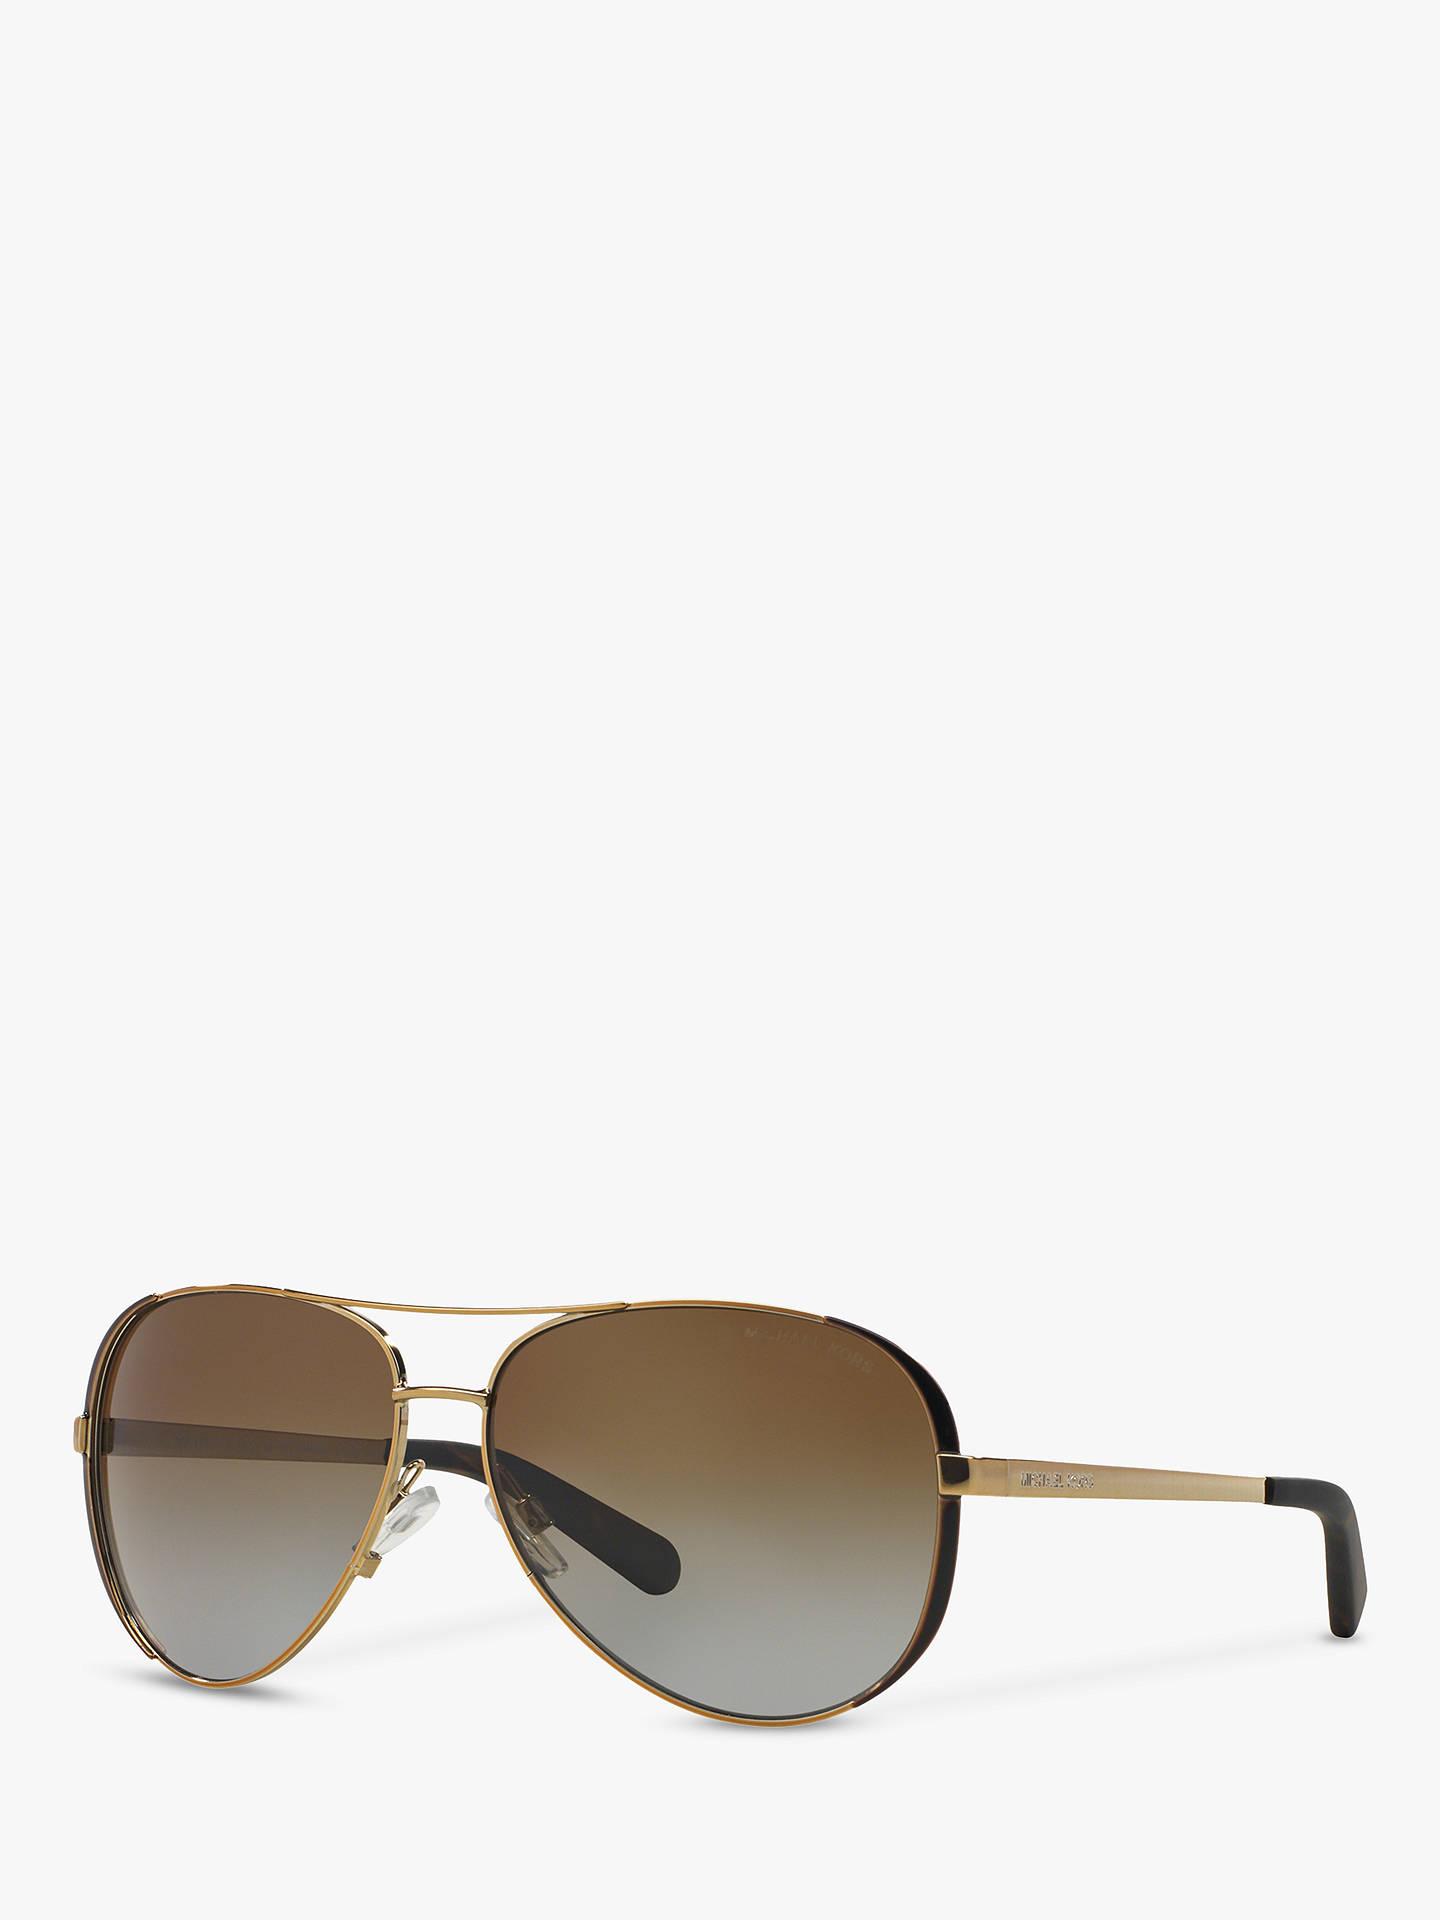 955e438b26 BuyMichael Kors MK5004 Chelsea Polarised Aviator Sunglasses